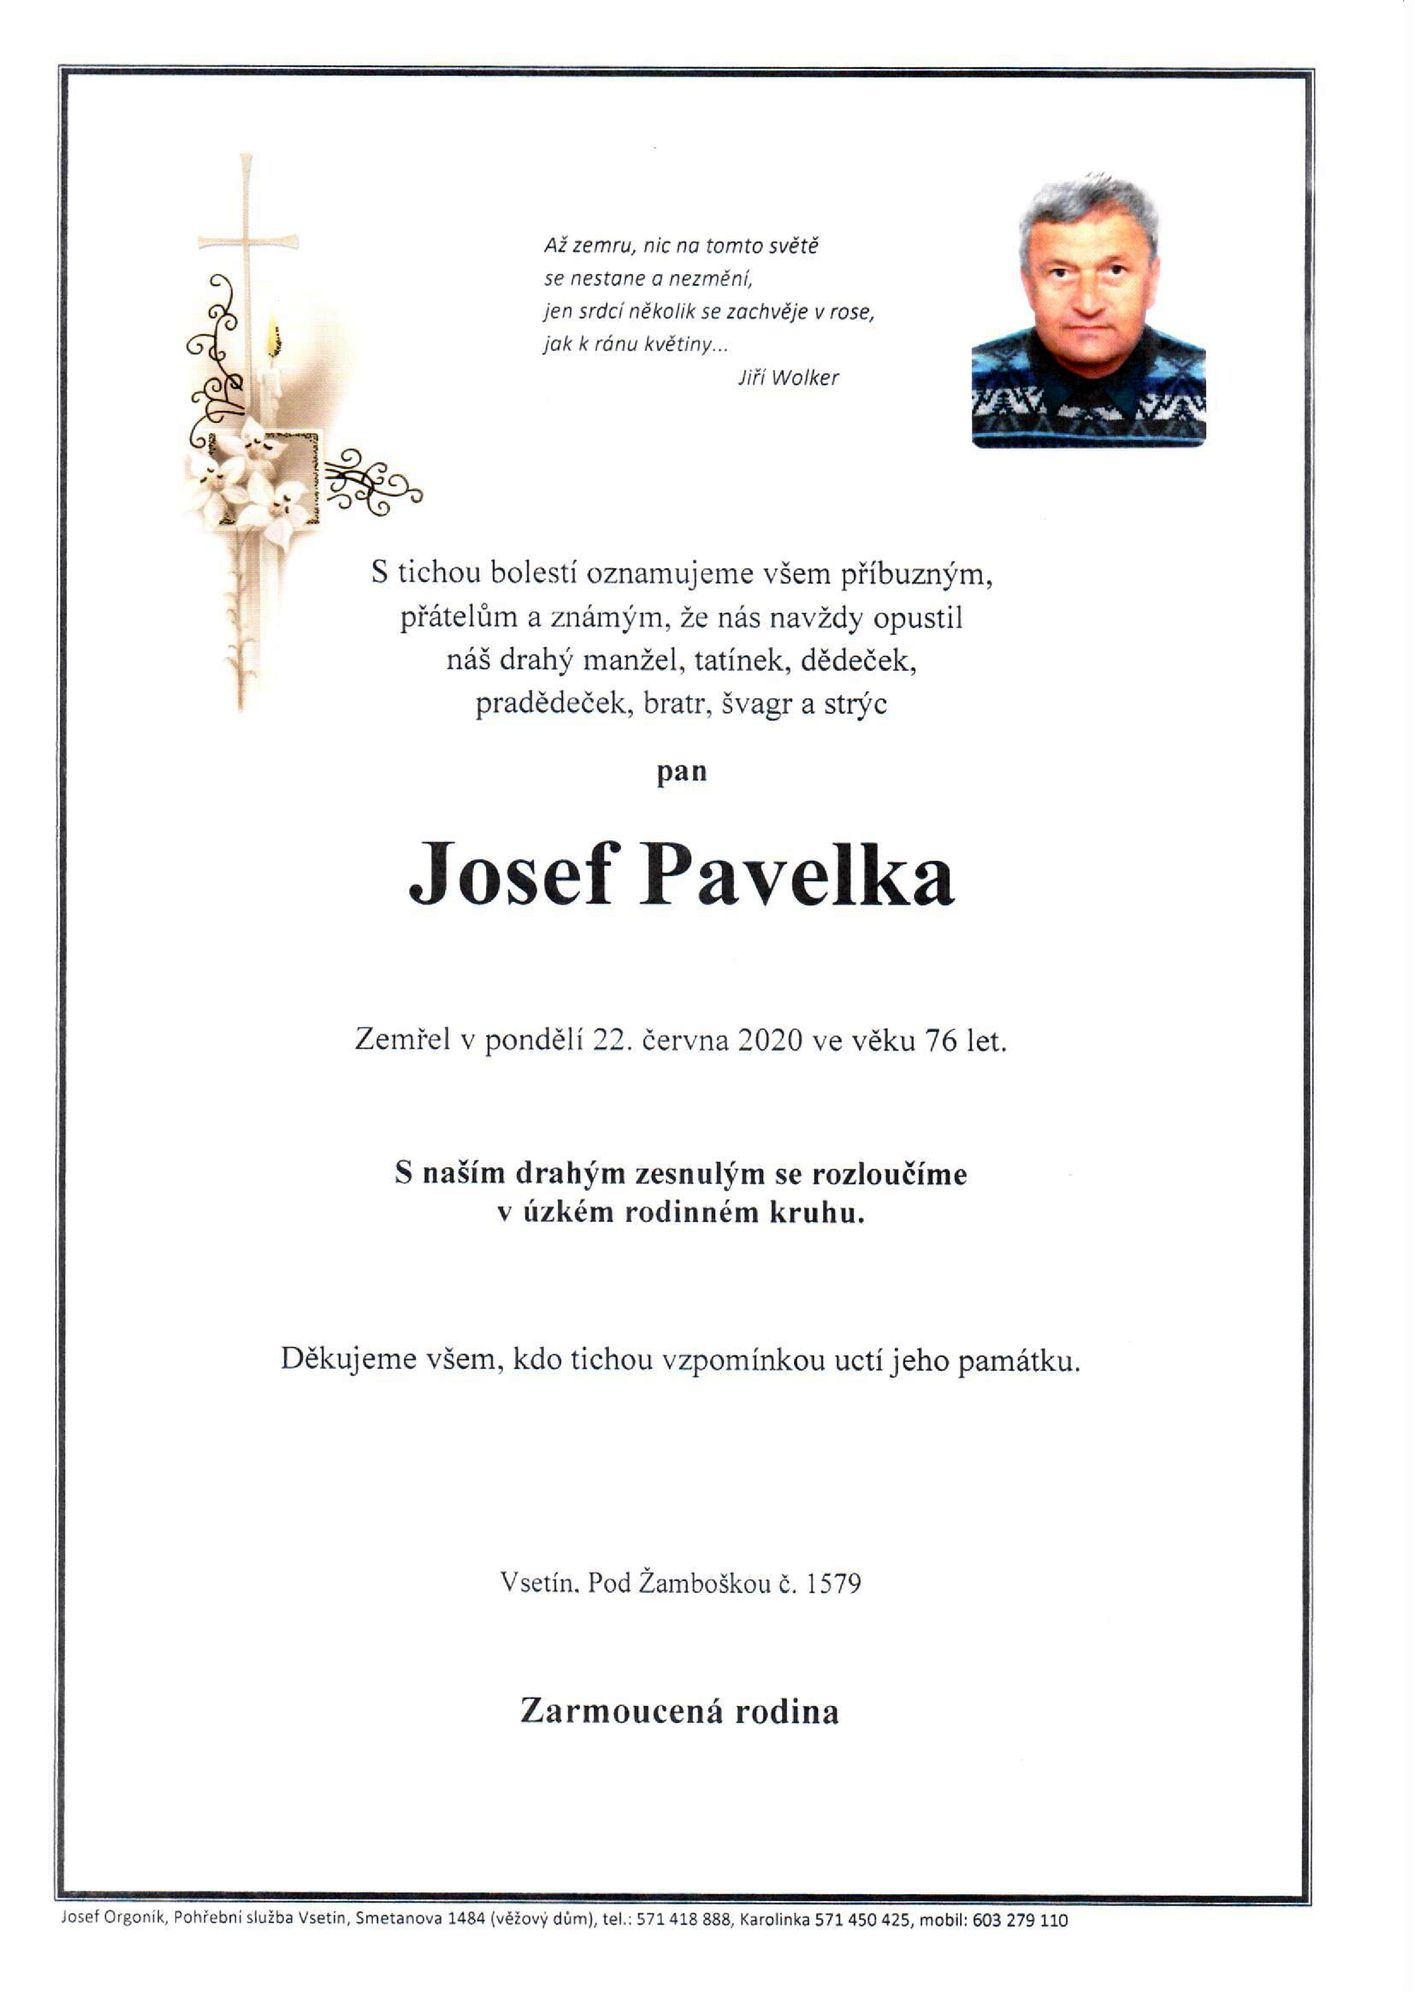 Josef Pavelka